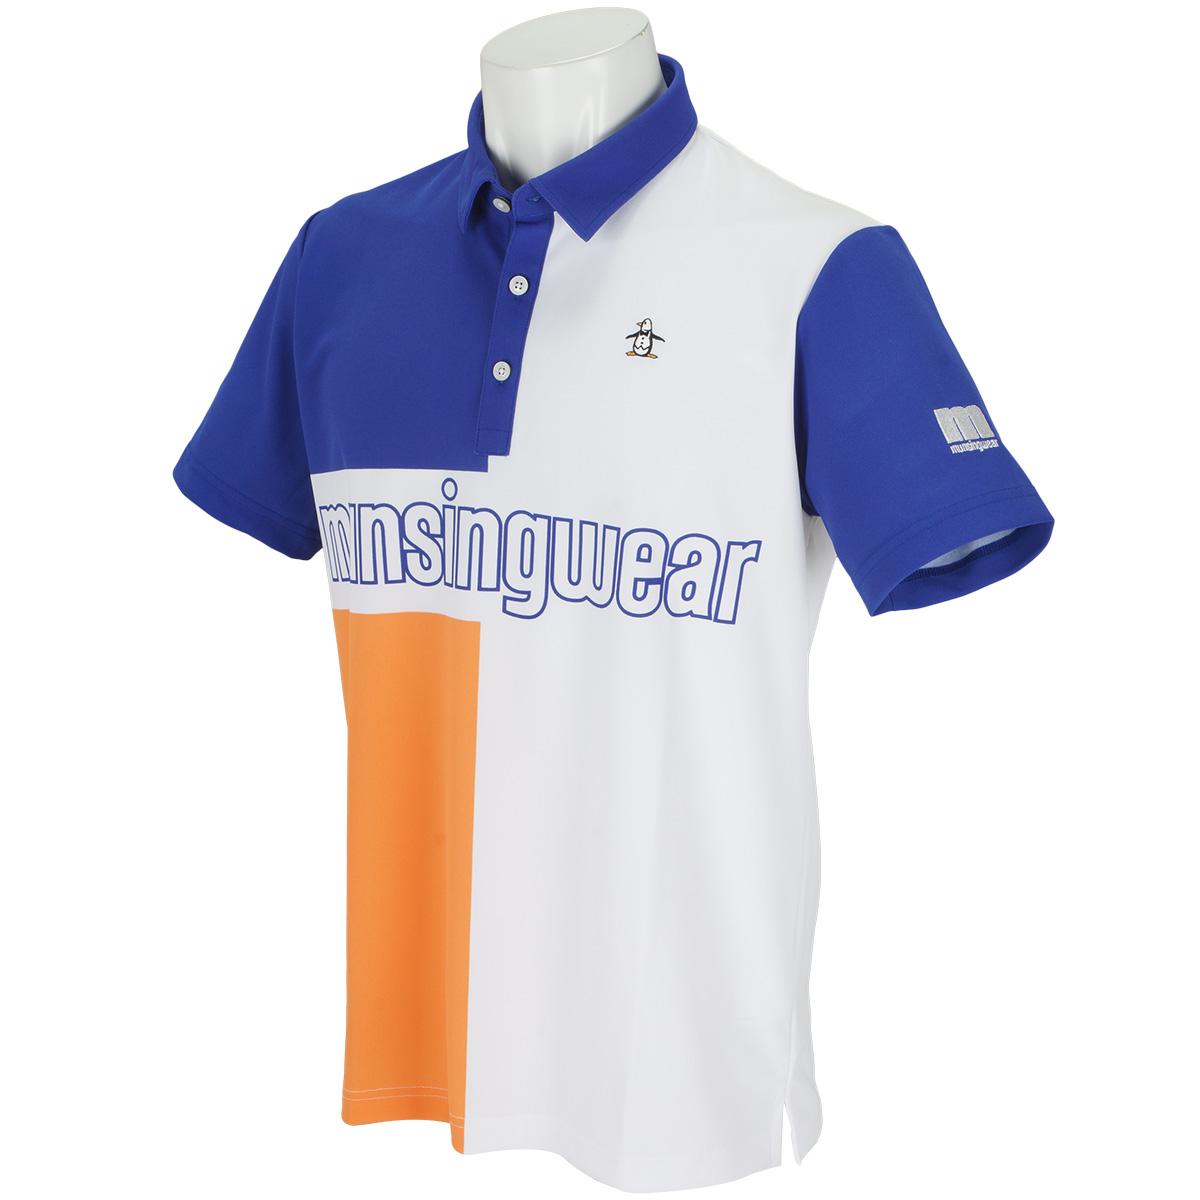 ENVOY COOLISTパネルプリント半袖ポロシャツ